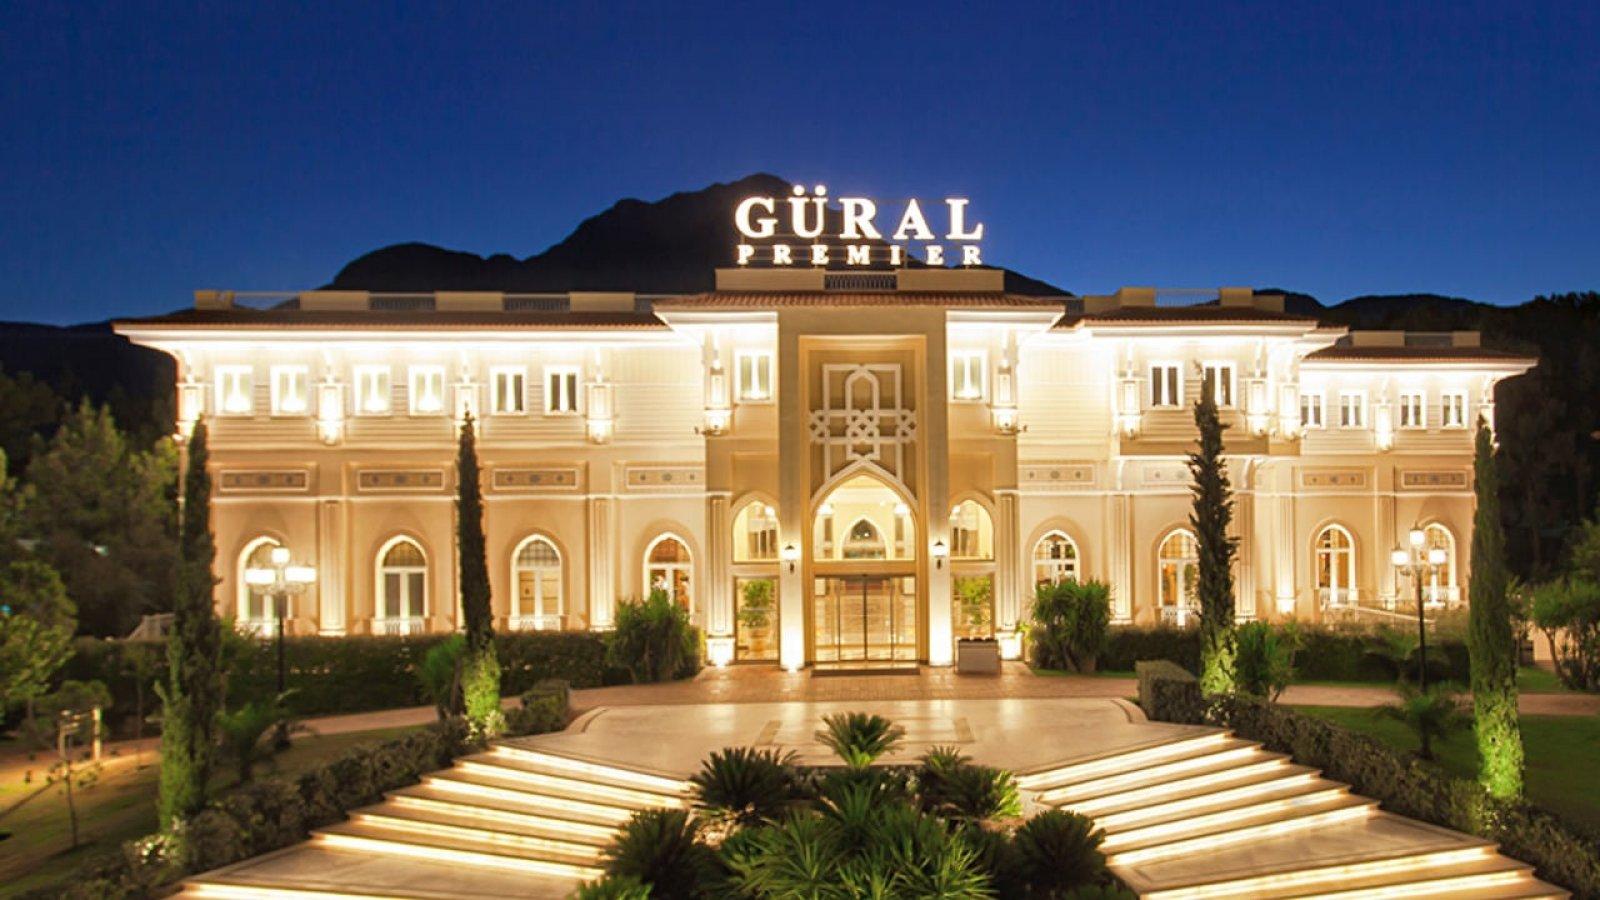 Antalya Belek Güral Premier Otel